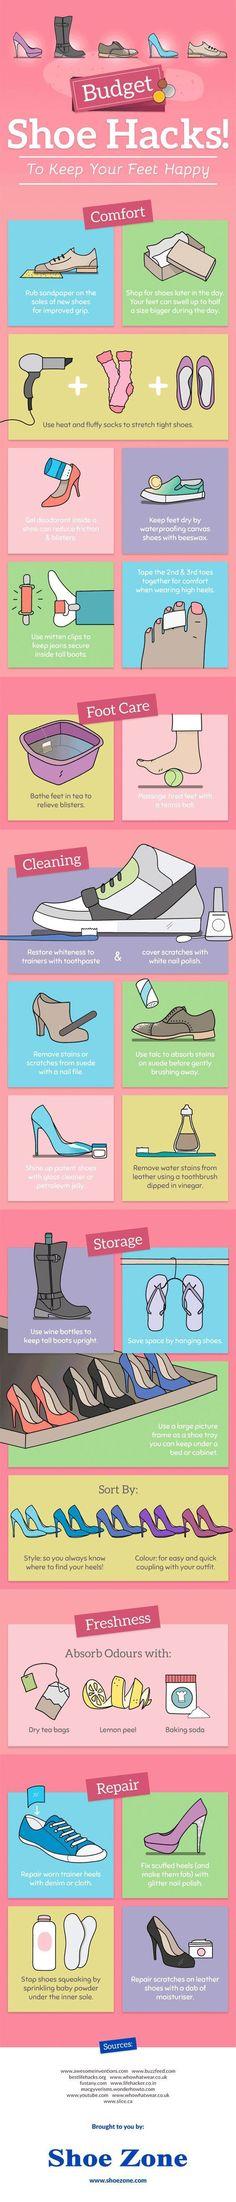 budget shoe hacks to keep your feet happy